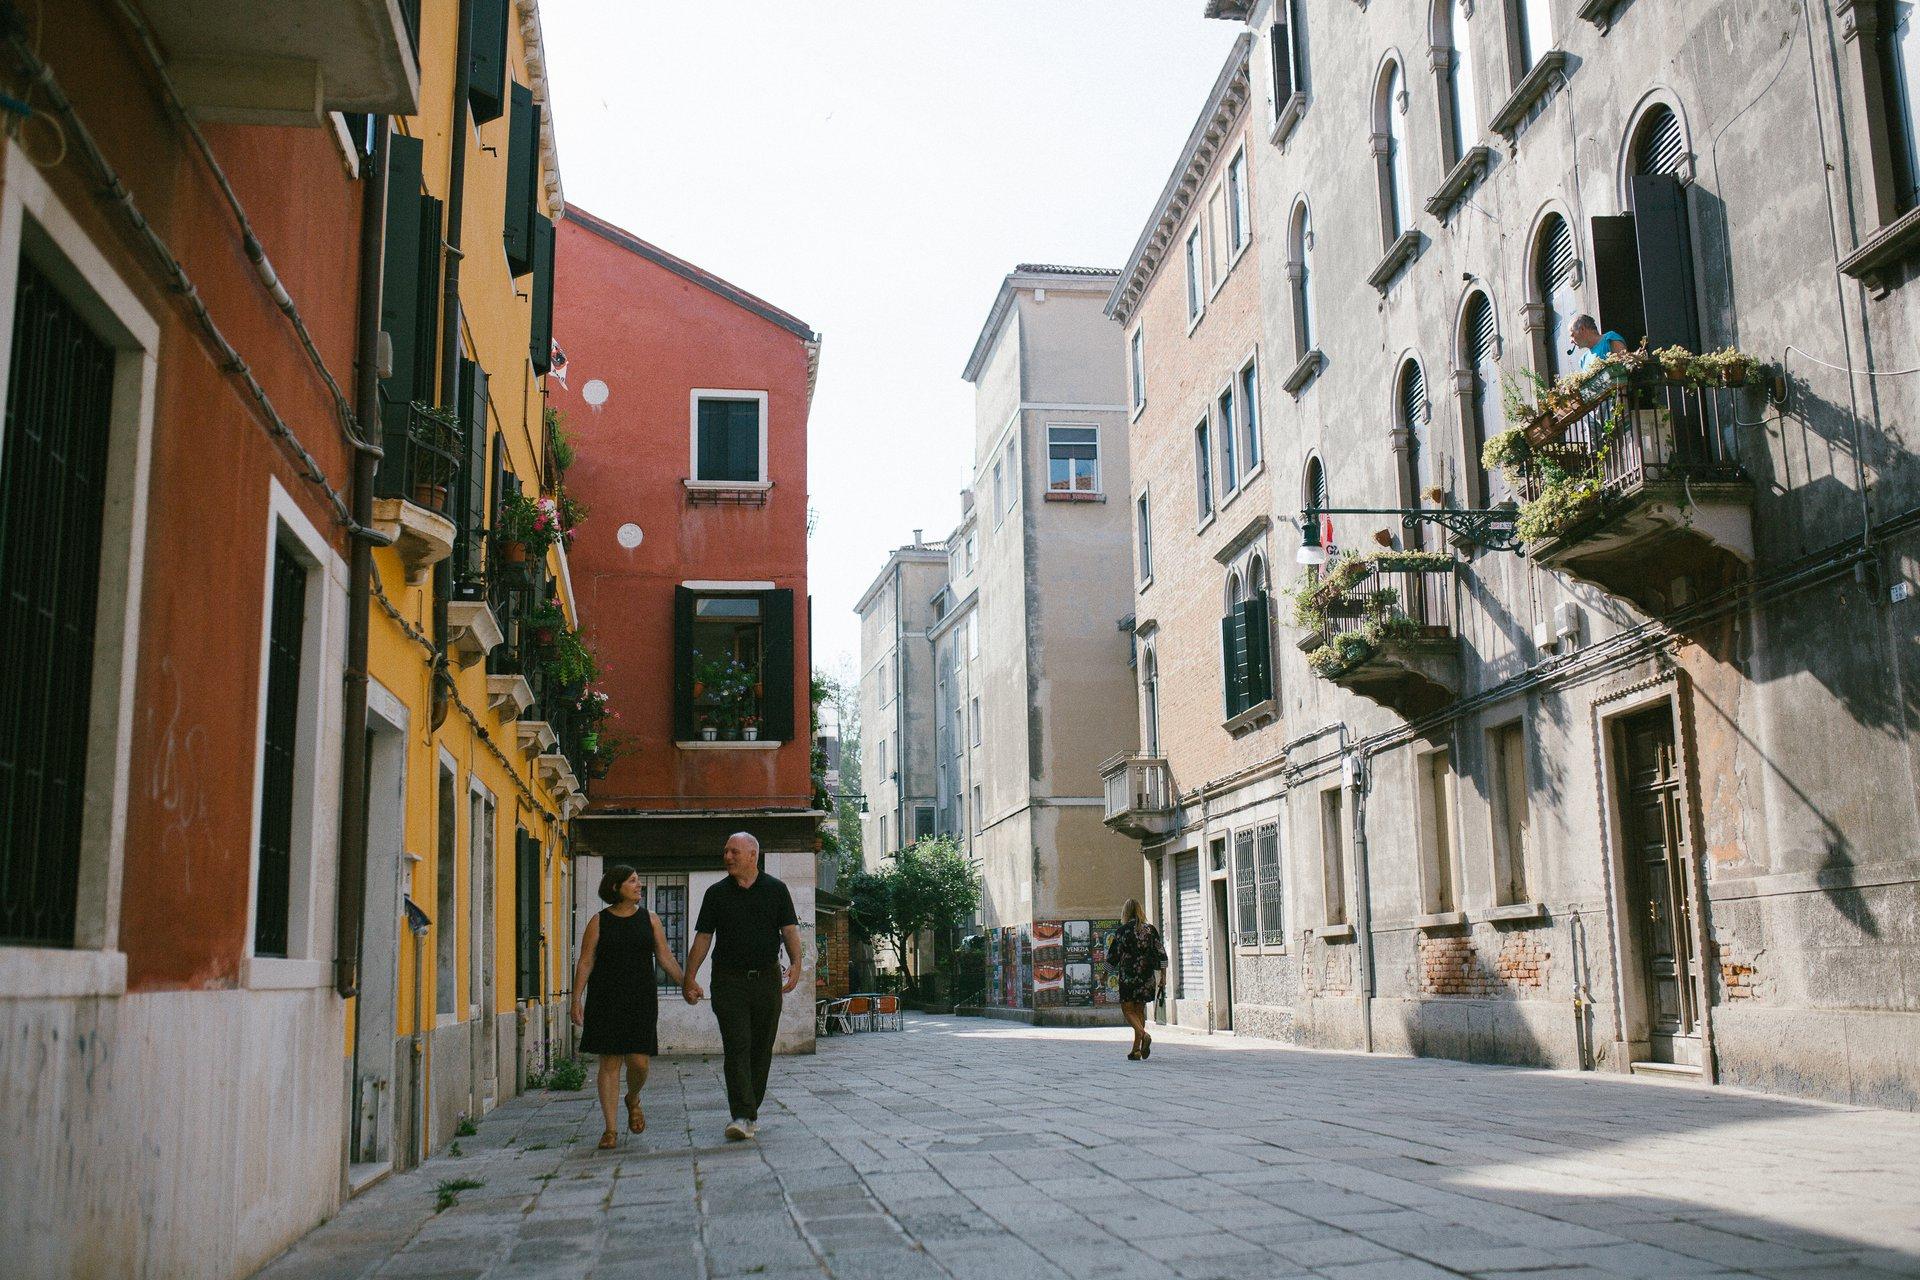 Venice-Italy-travel-story-Flytographer-20